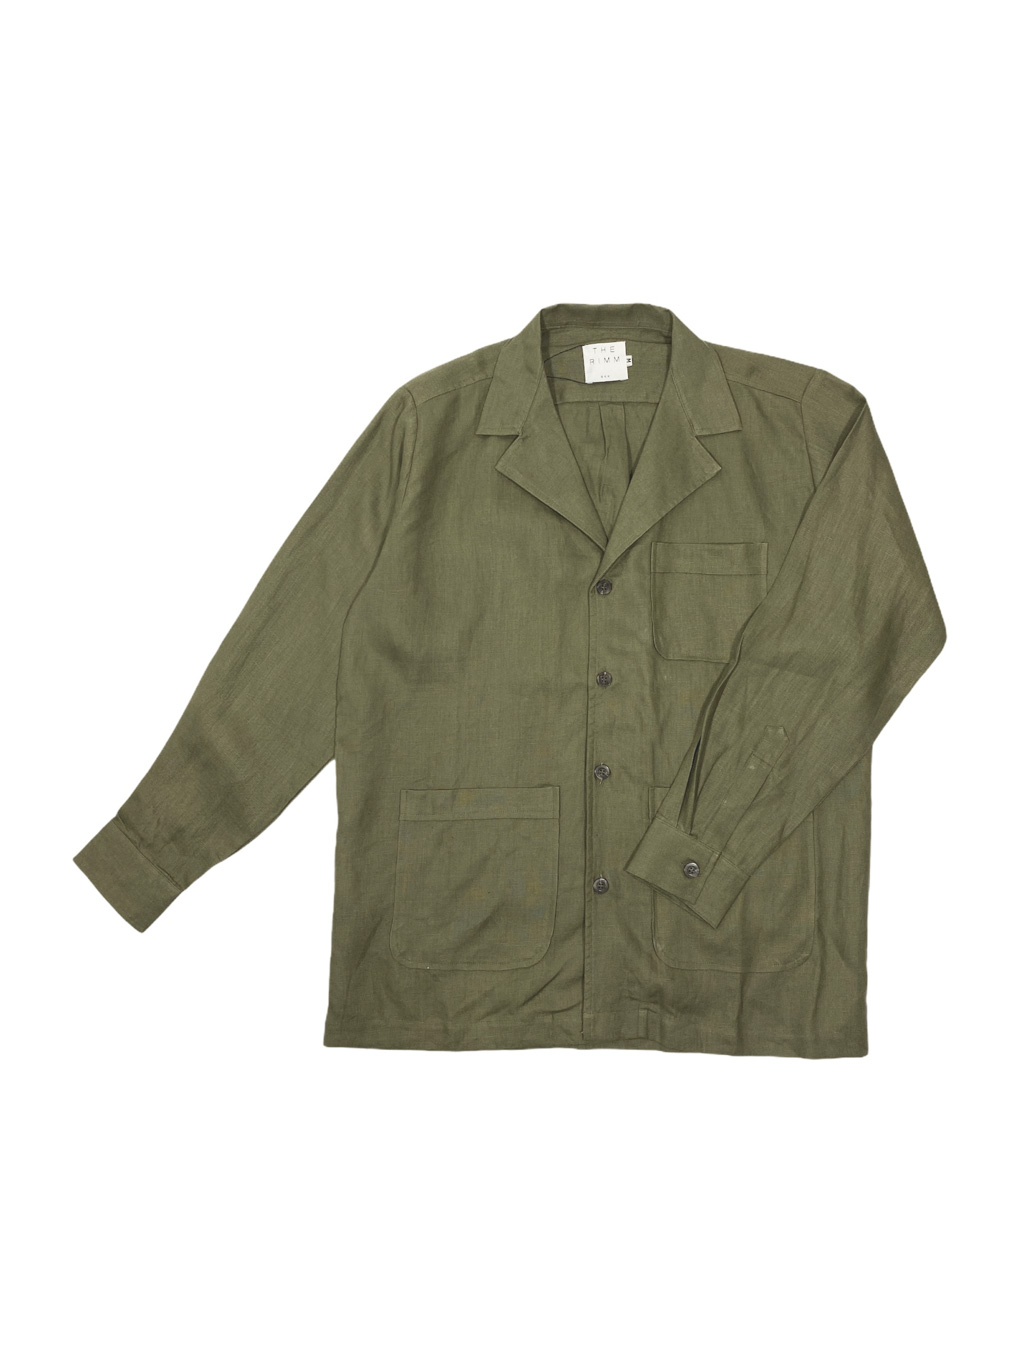 Linen wanderlust jackets (Olive)